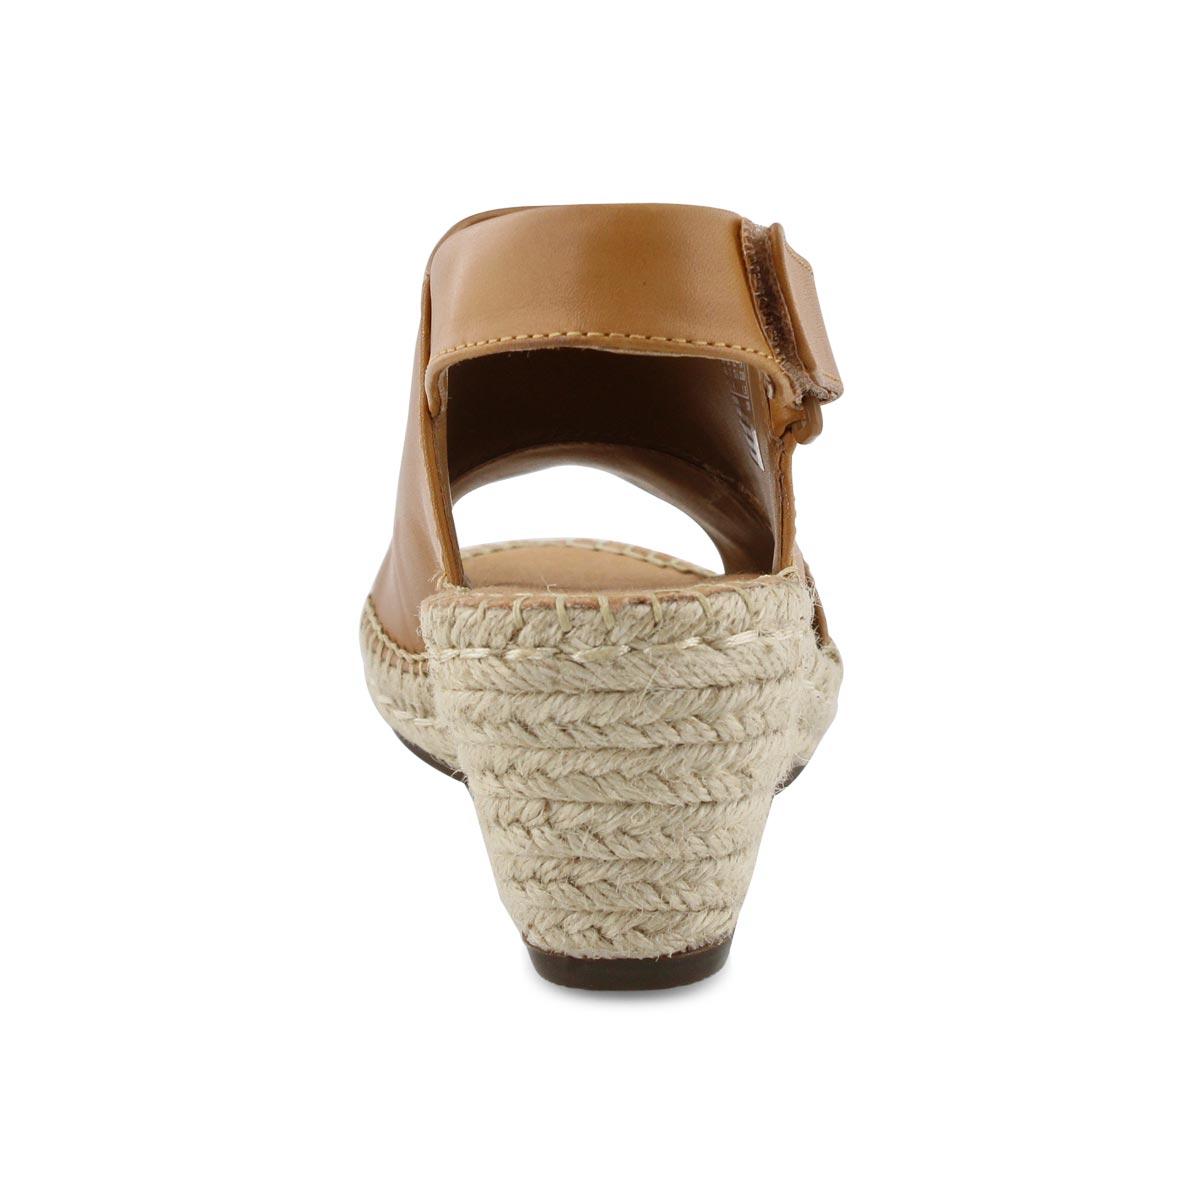 dd8c52bea05 Women's PETRINA ABBY light tan wedge sandals